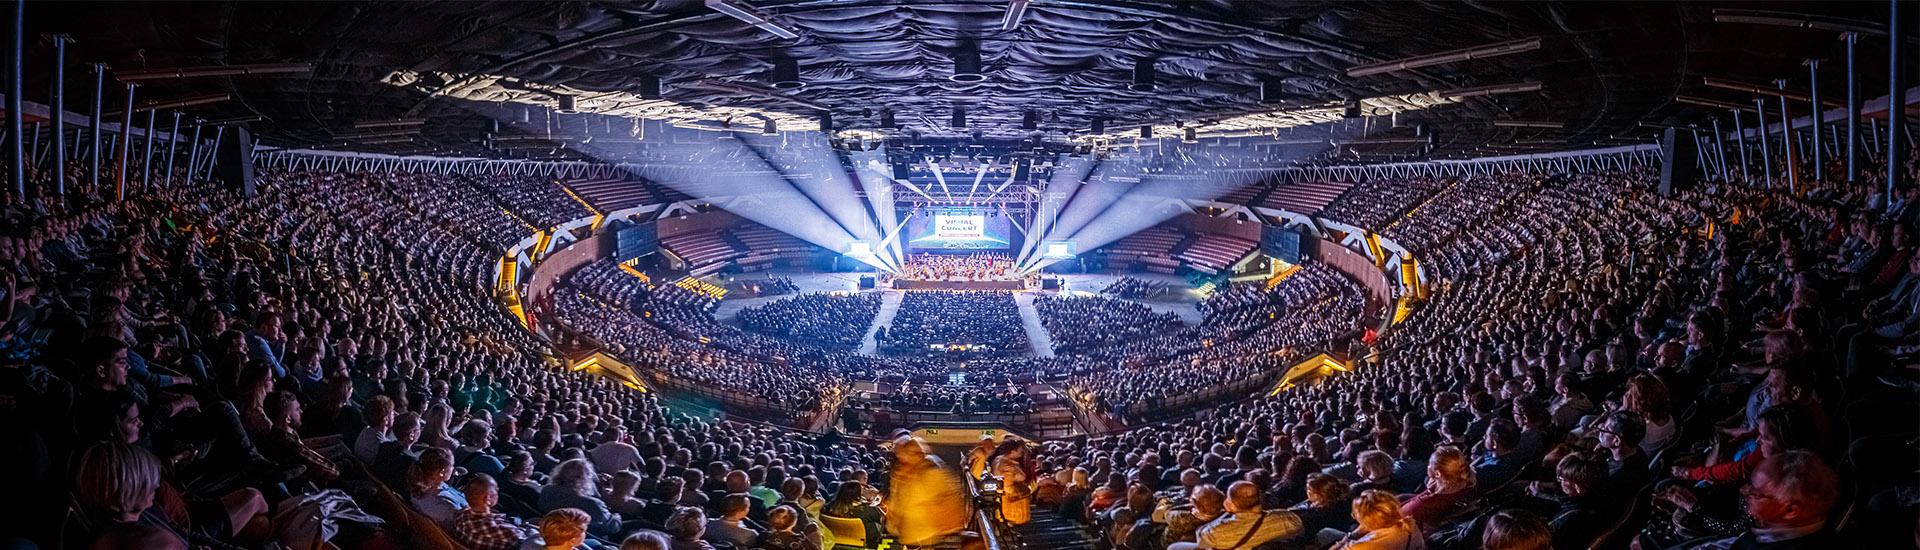 Visual Concert - Spodek Katowice